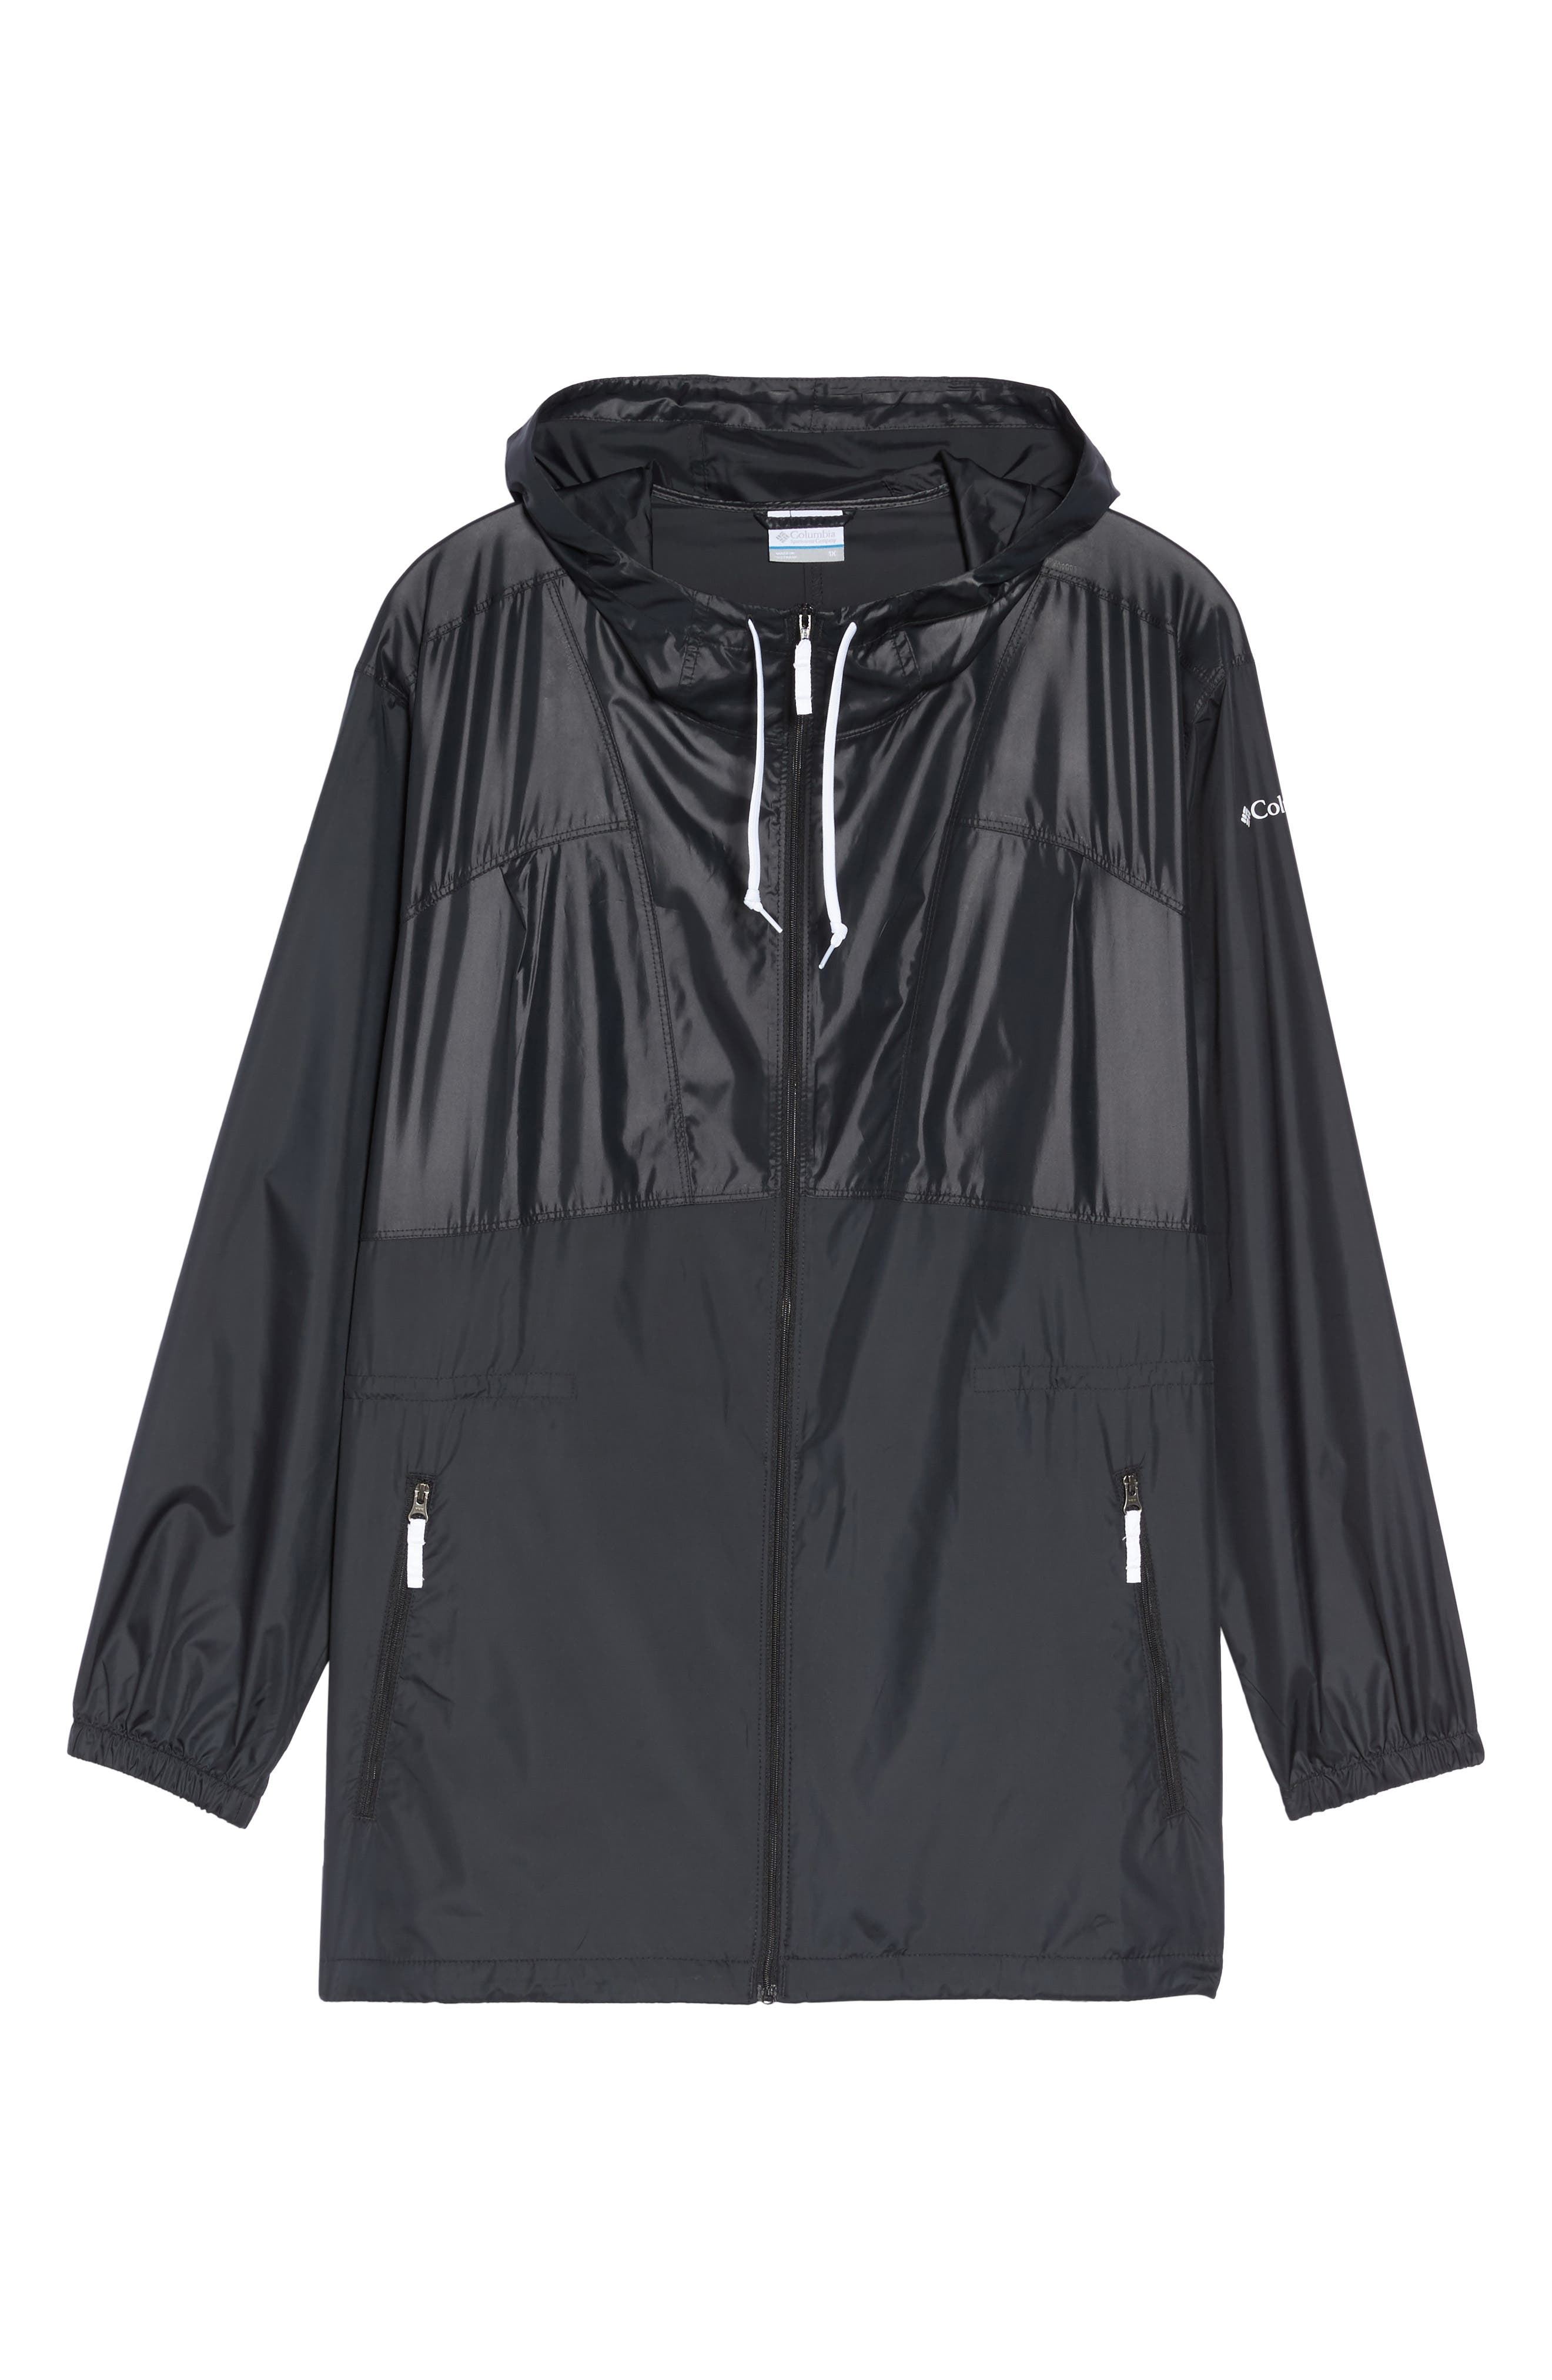 Flashback<sup>™</sup> Water Resistant Hooded Windbreaker,                             Alternate thumbnail 6, color,                             Black Shiny/ Matte White